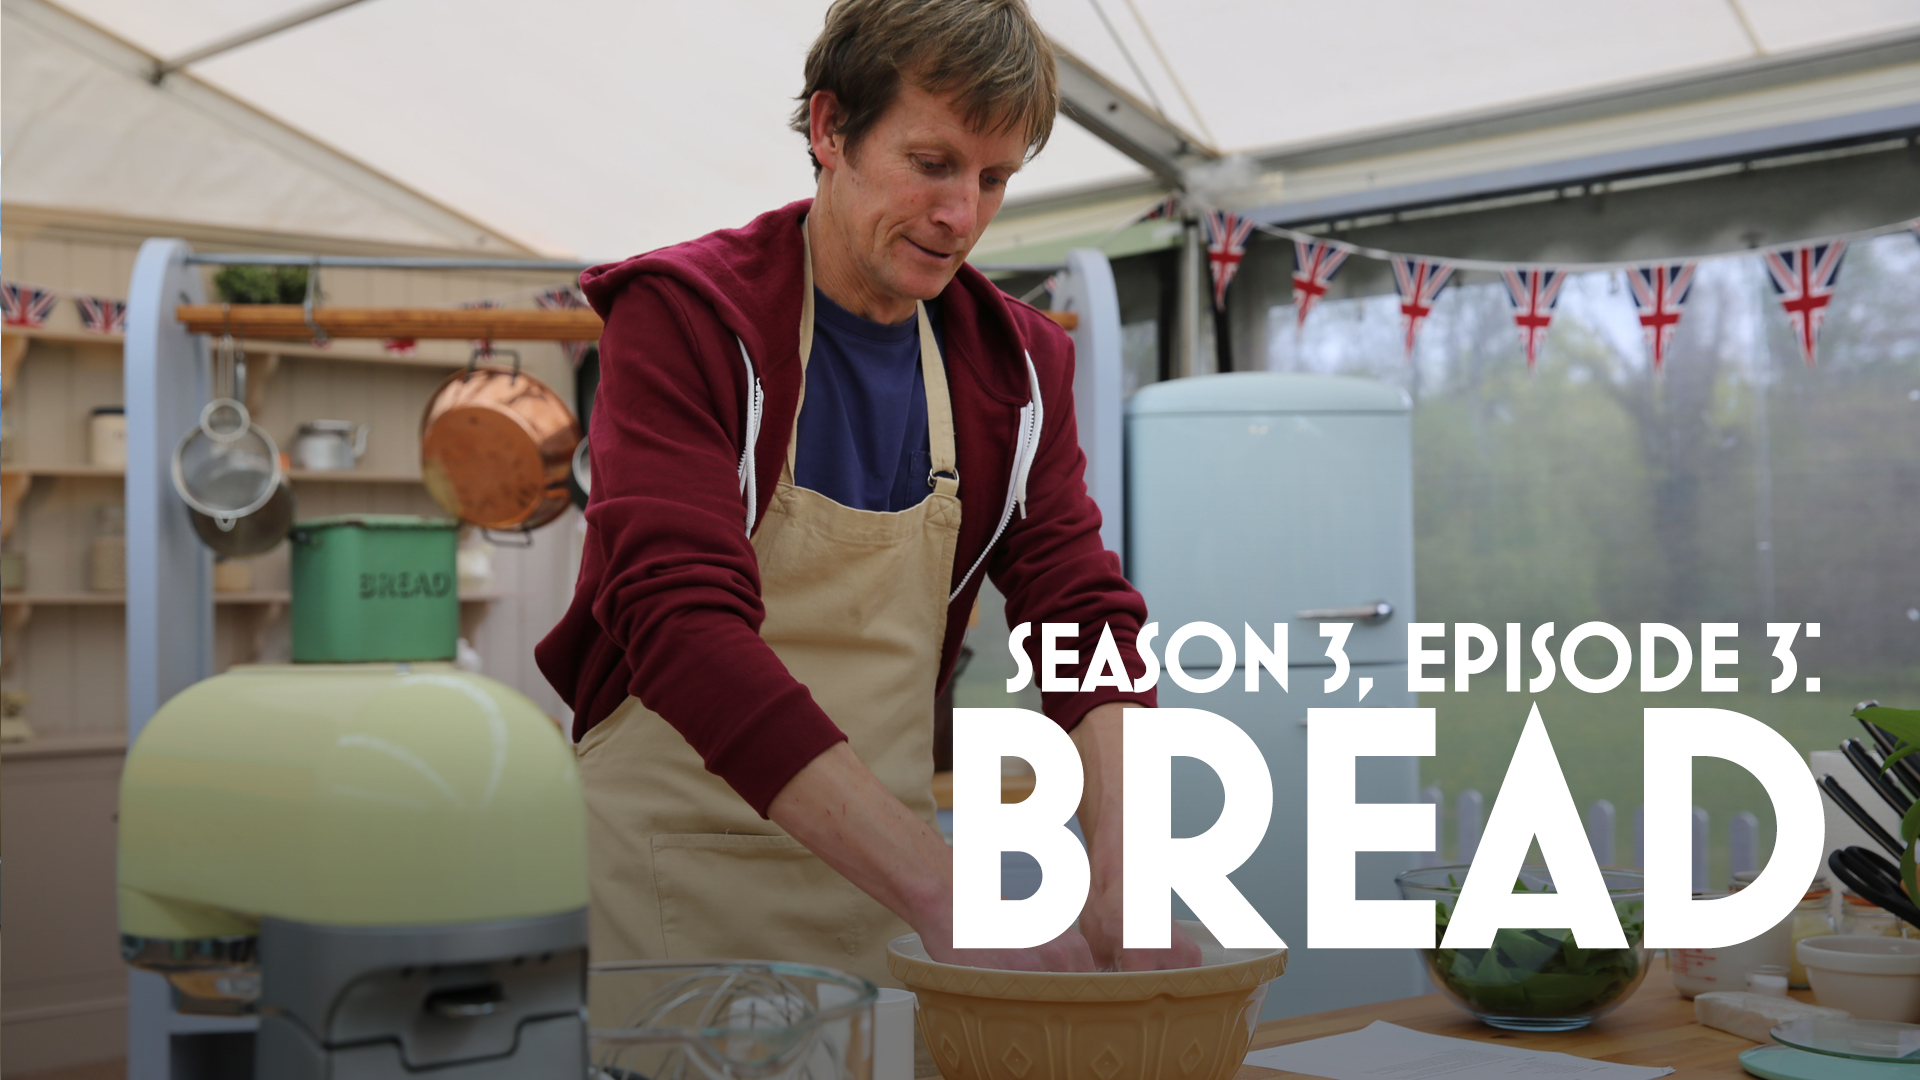 Episode 3: Bread